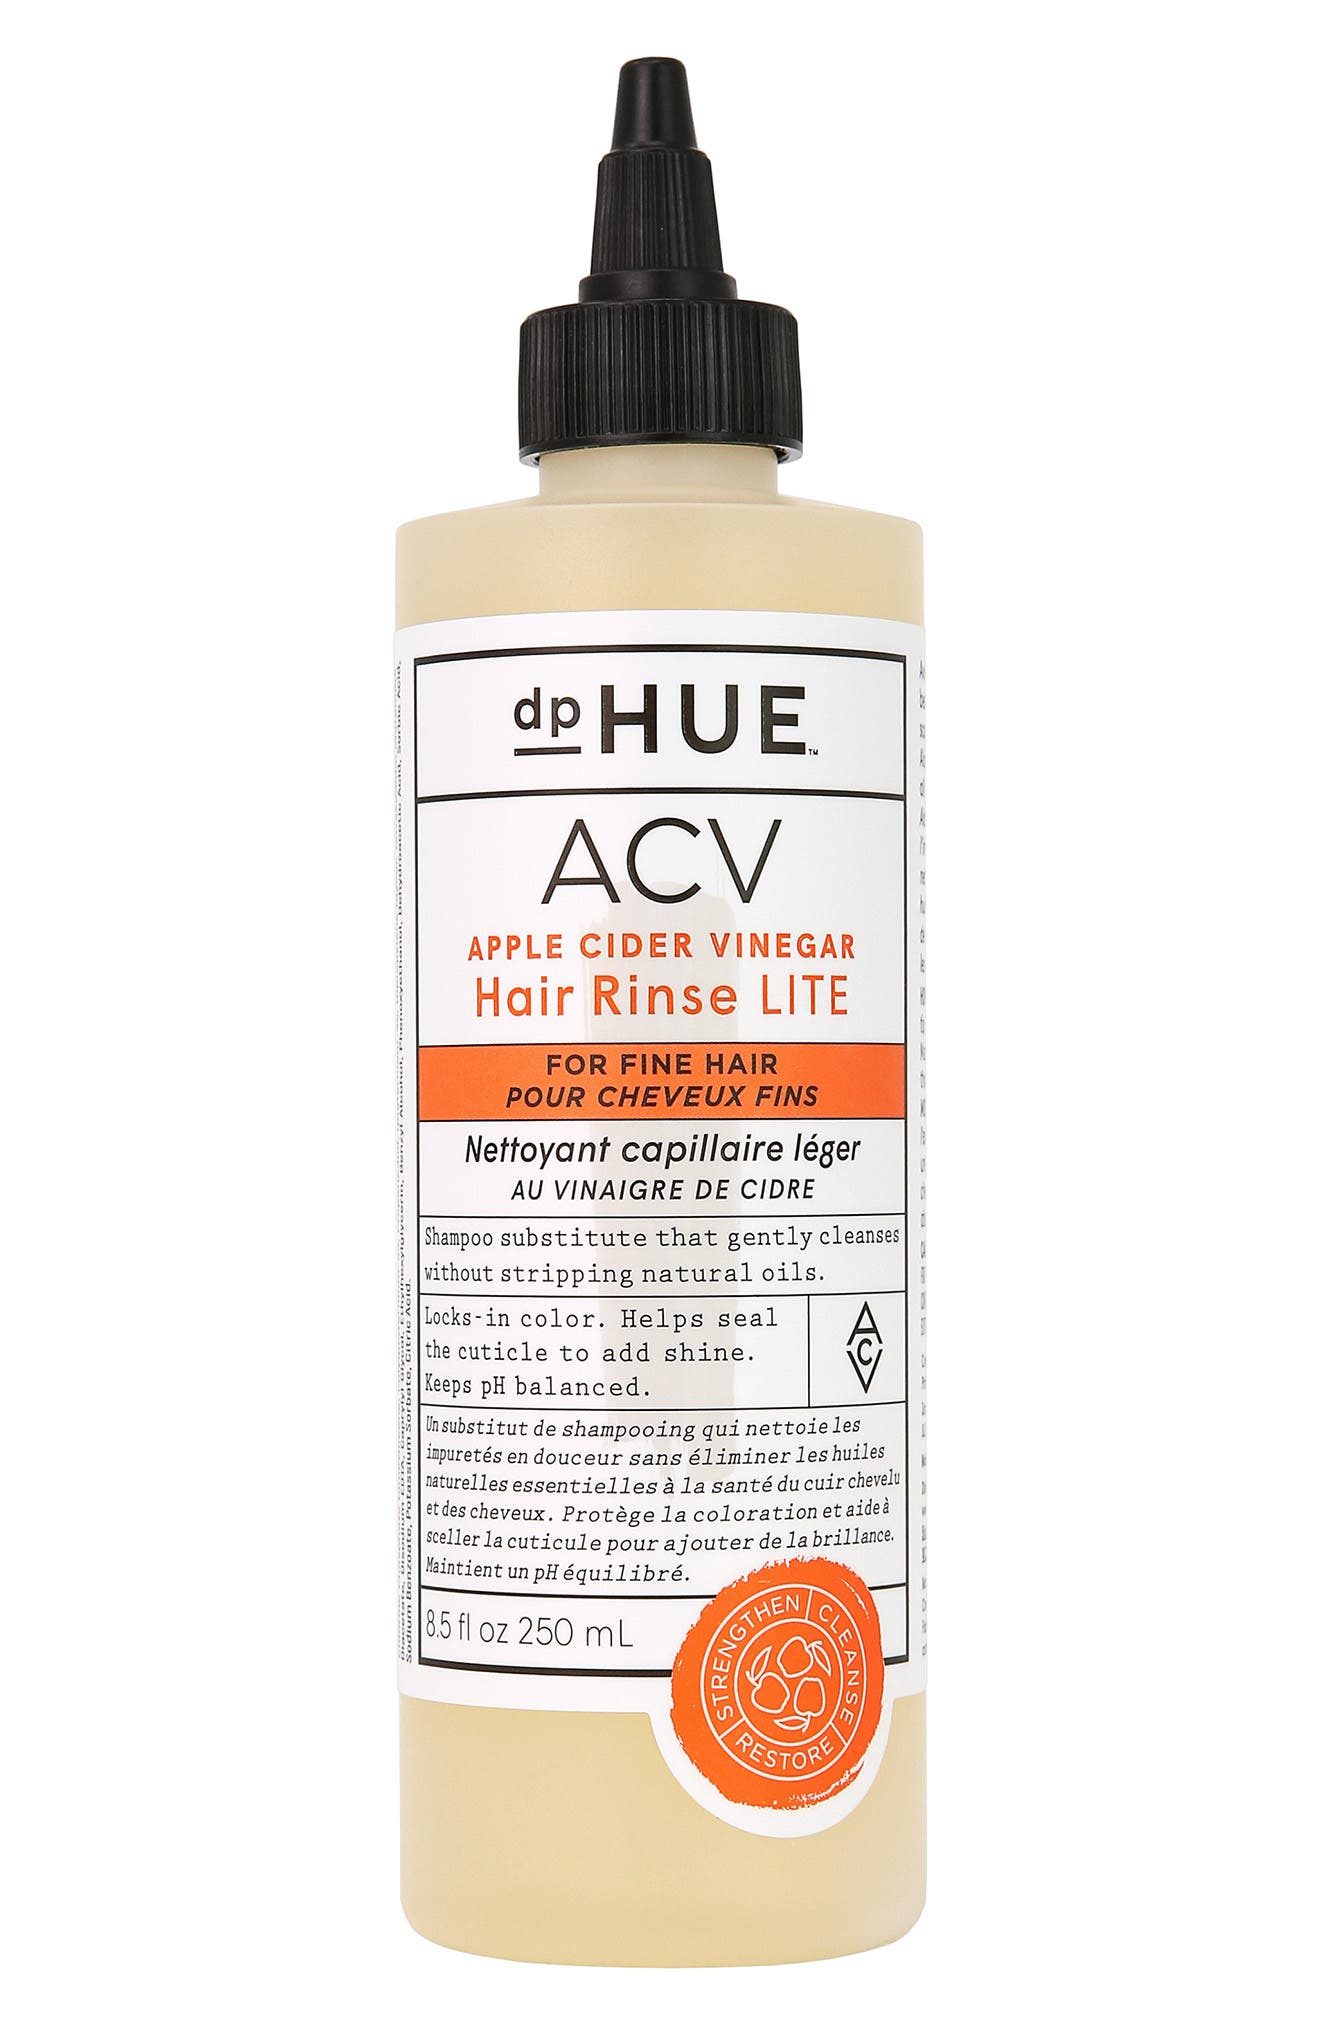 Apple Cider Vinegar Hair Rinse Lite